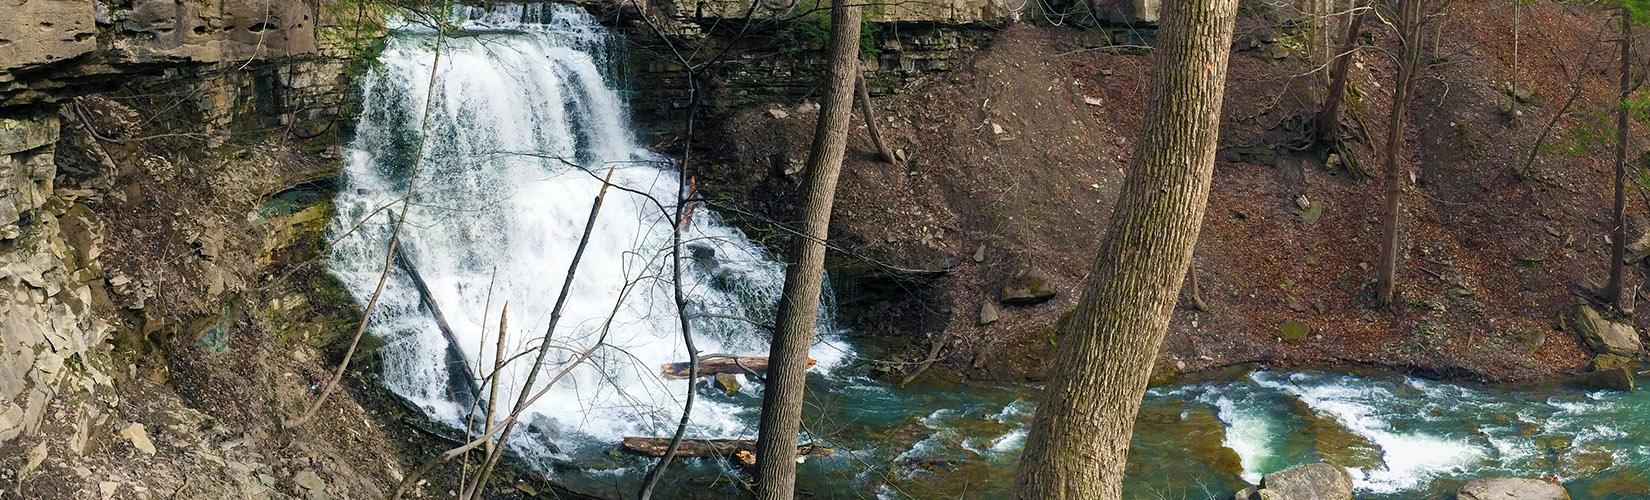 Hiking DeCew Falls, Niagara's Year Round Beauty :: I've Been Bit! A Travel Blog